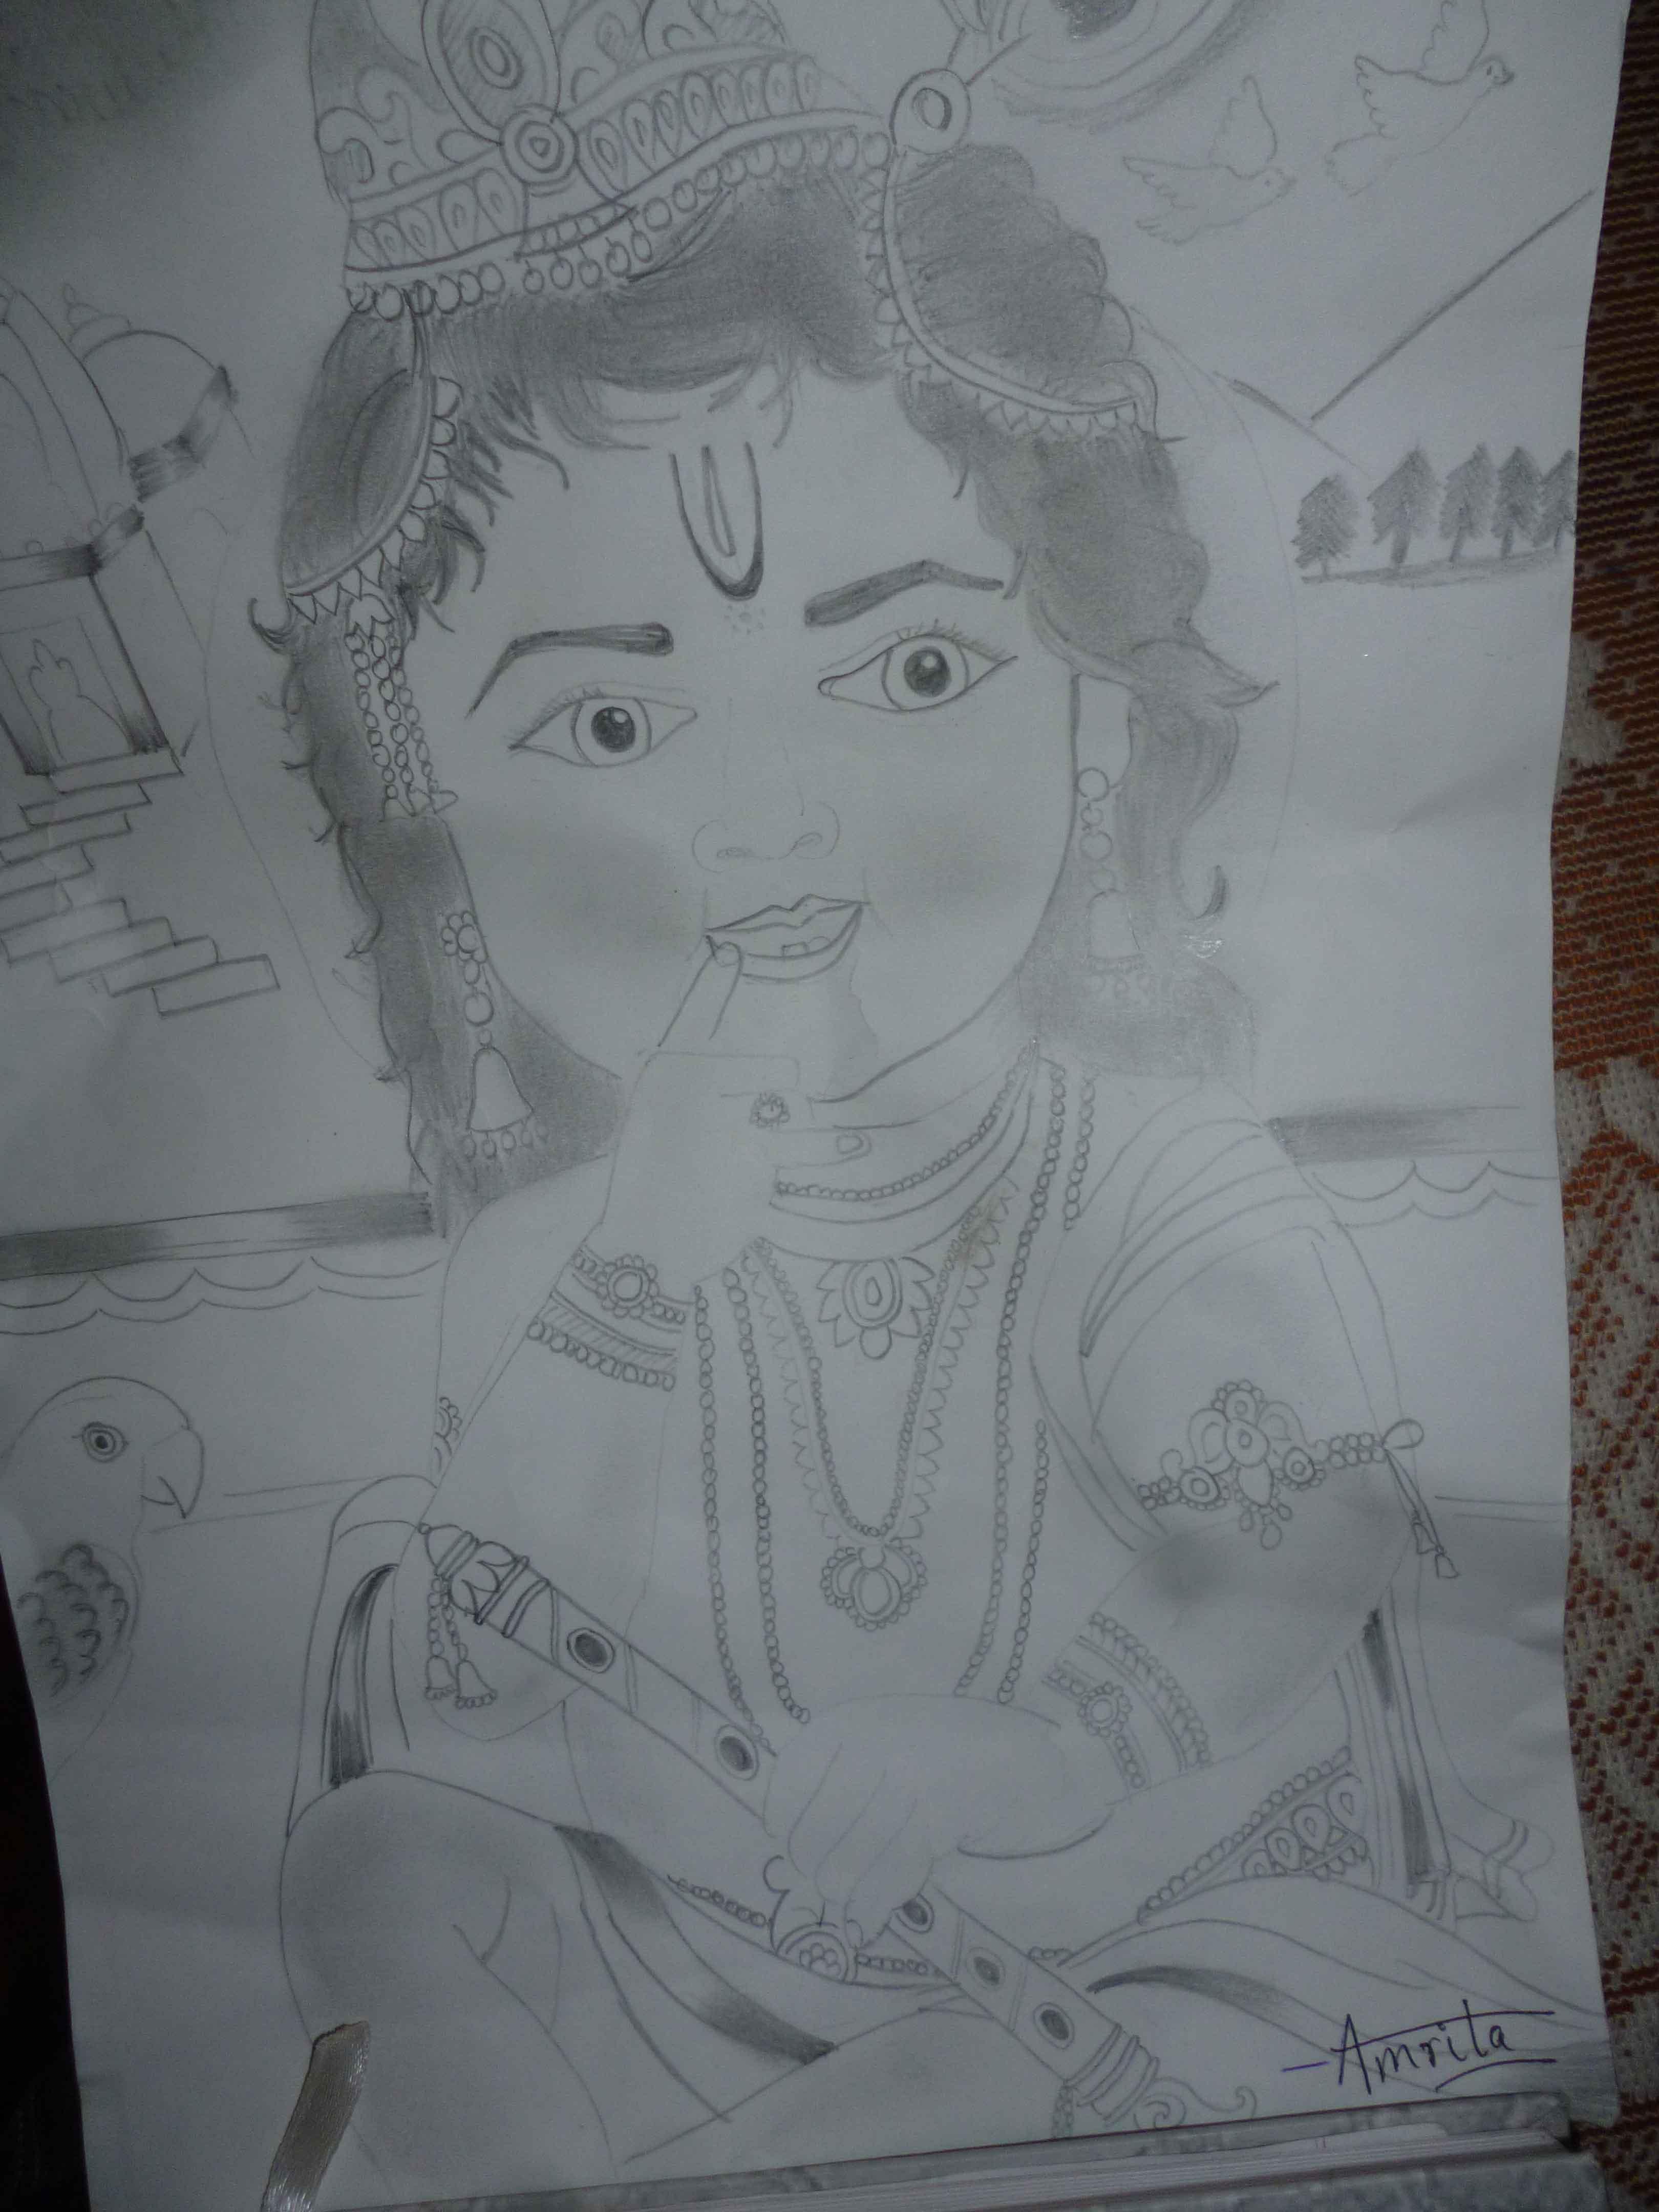 (Chawalla) Sunita Gyan Niketan Public School (2)